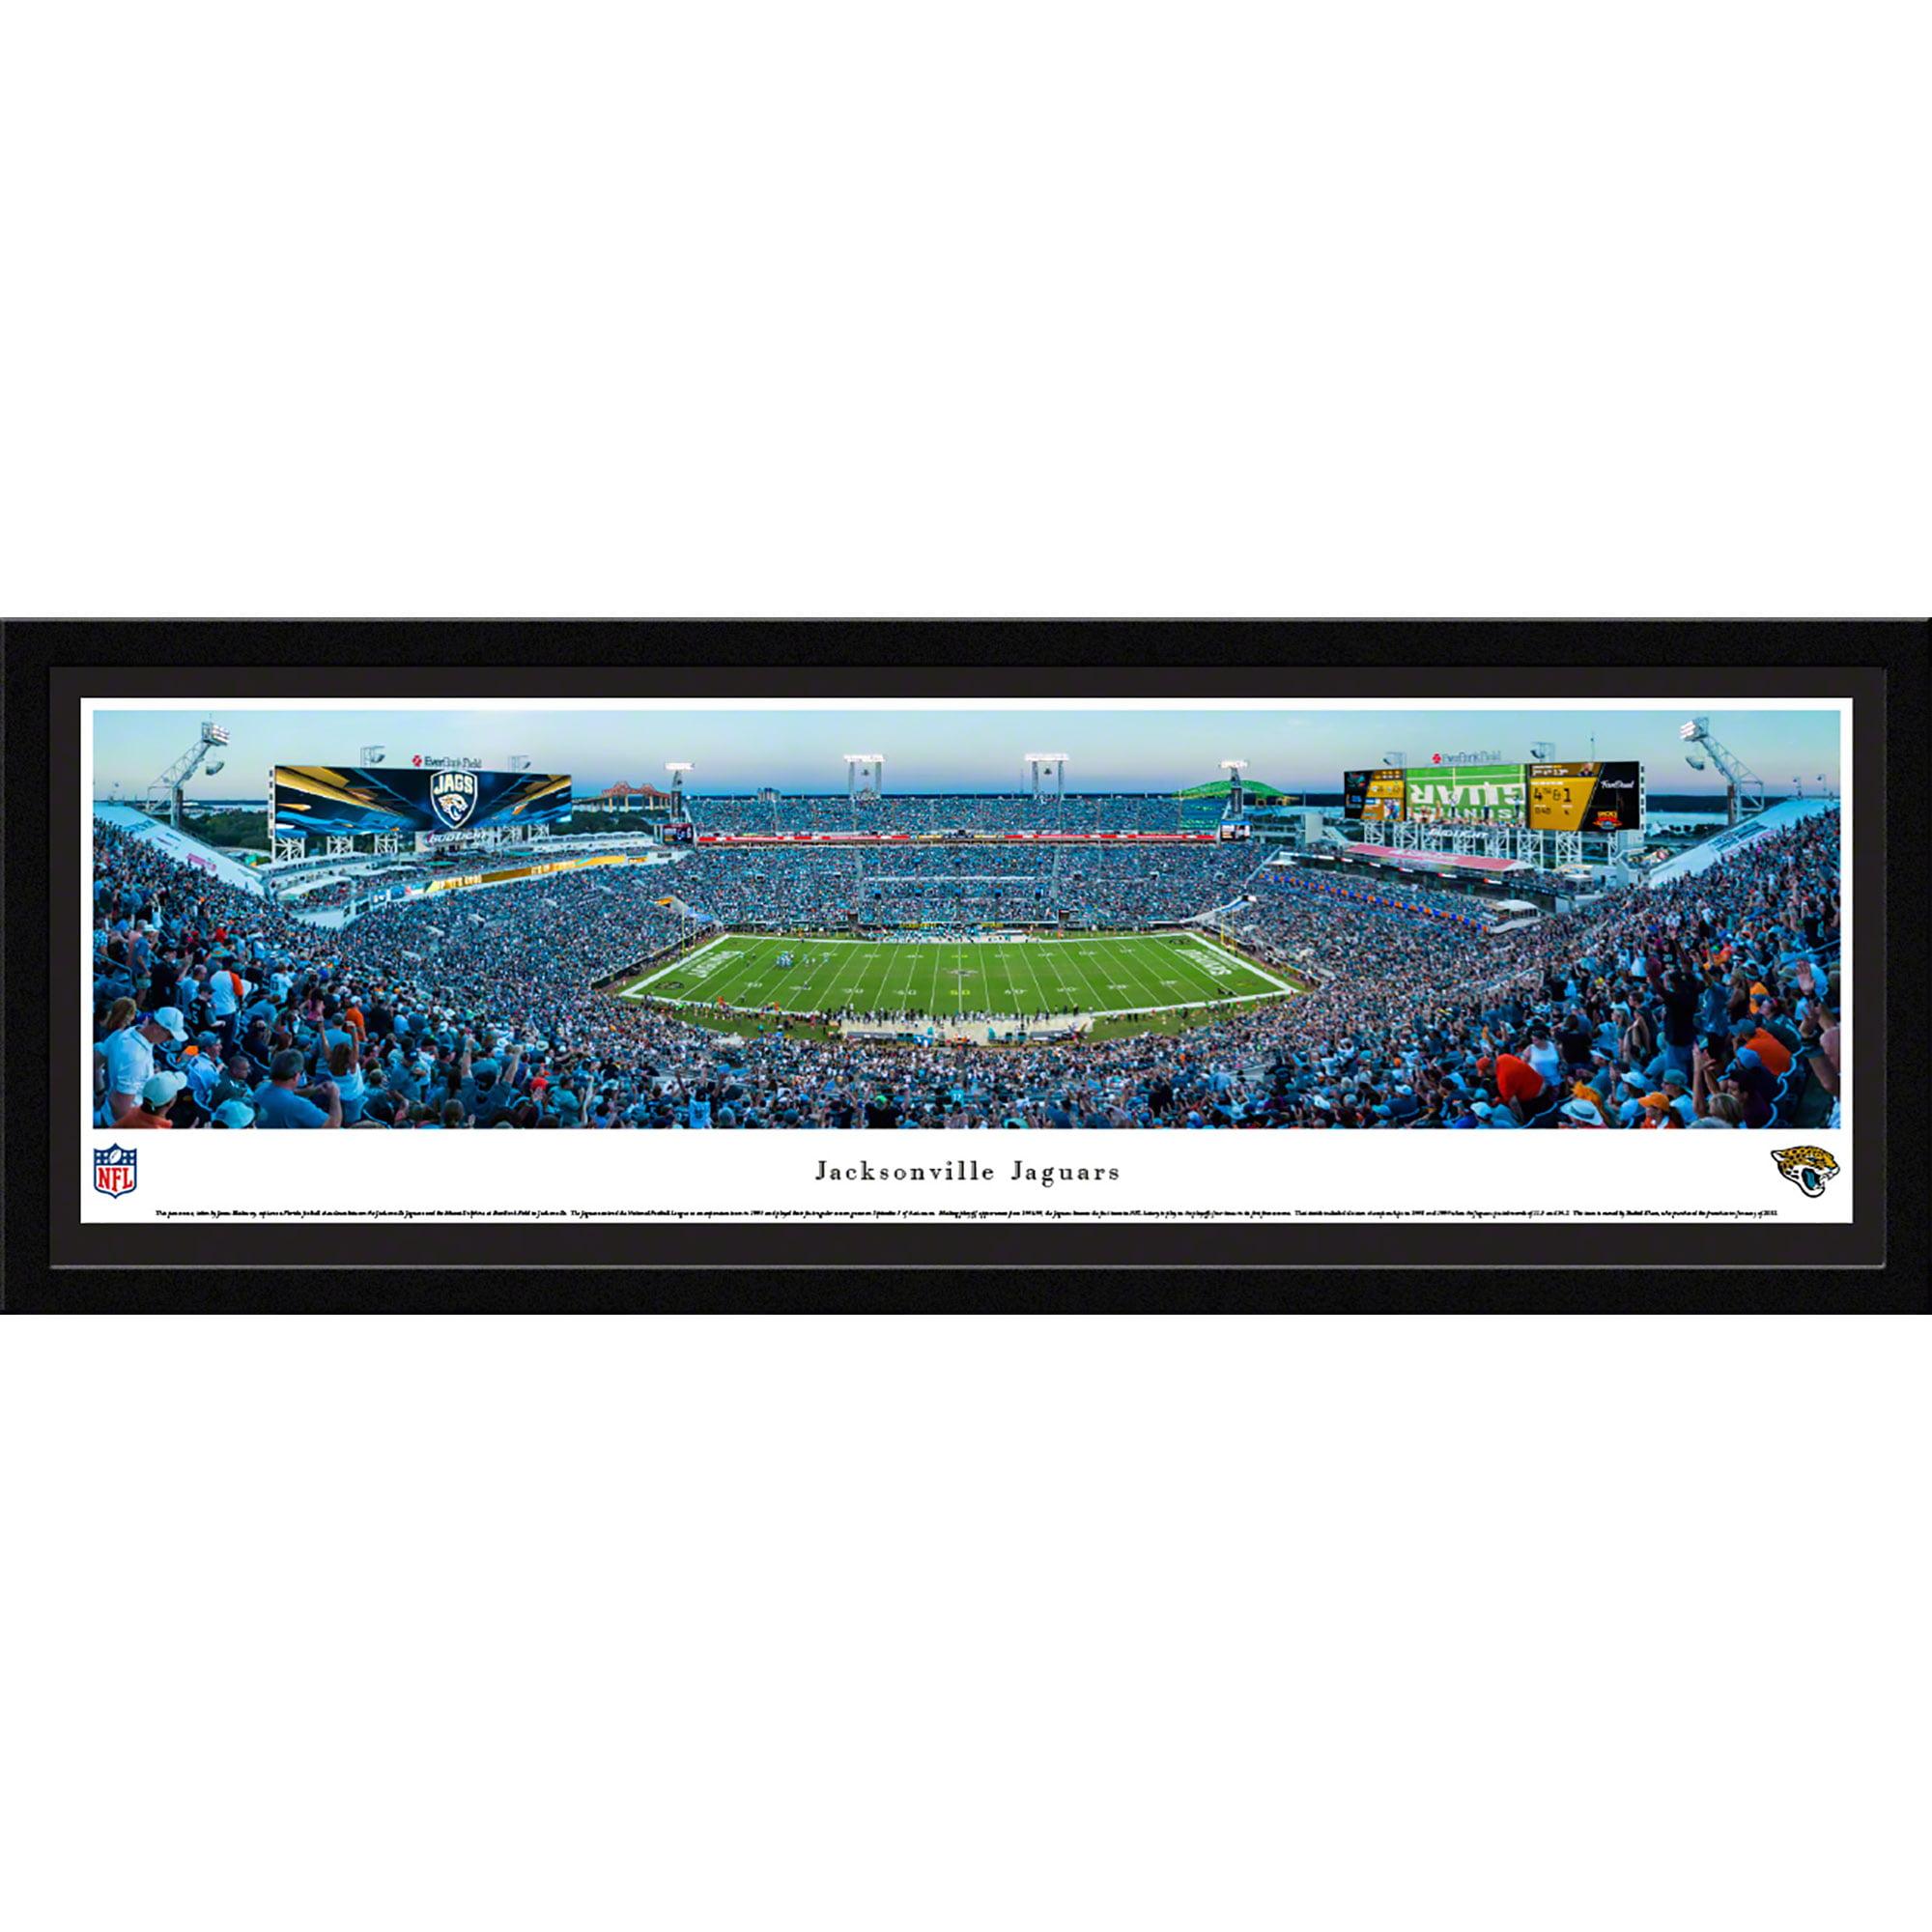 Jacksonville Jaguars 50 Yard Line At Everbank Field Blakeway Panoramas Nfl Print With Select Frame And Single Mat Walmart Com Walmart Com